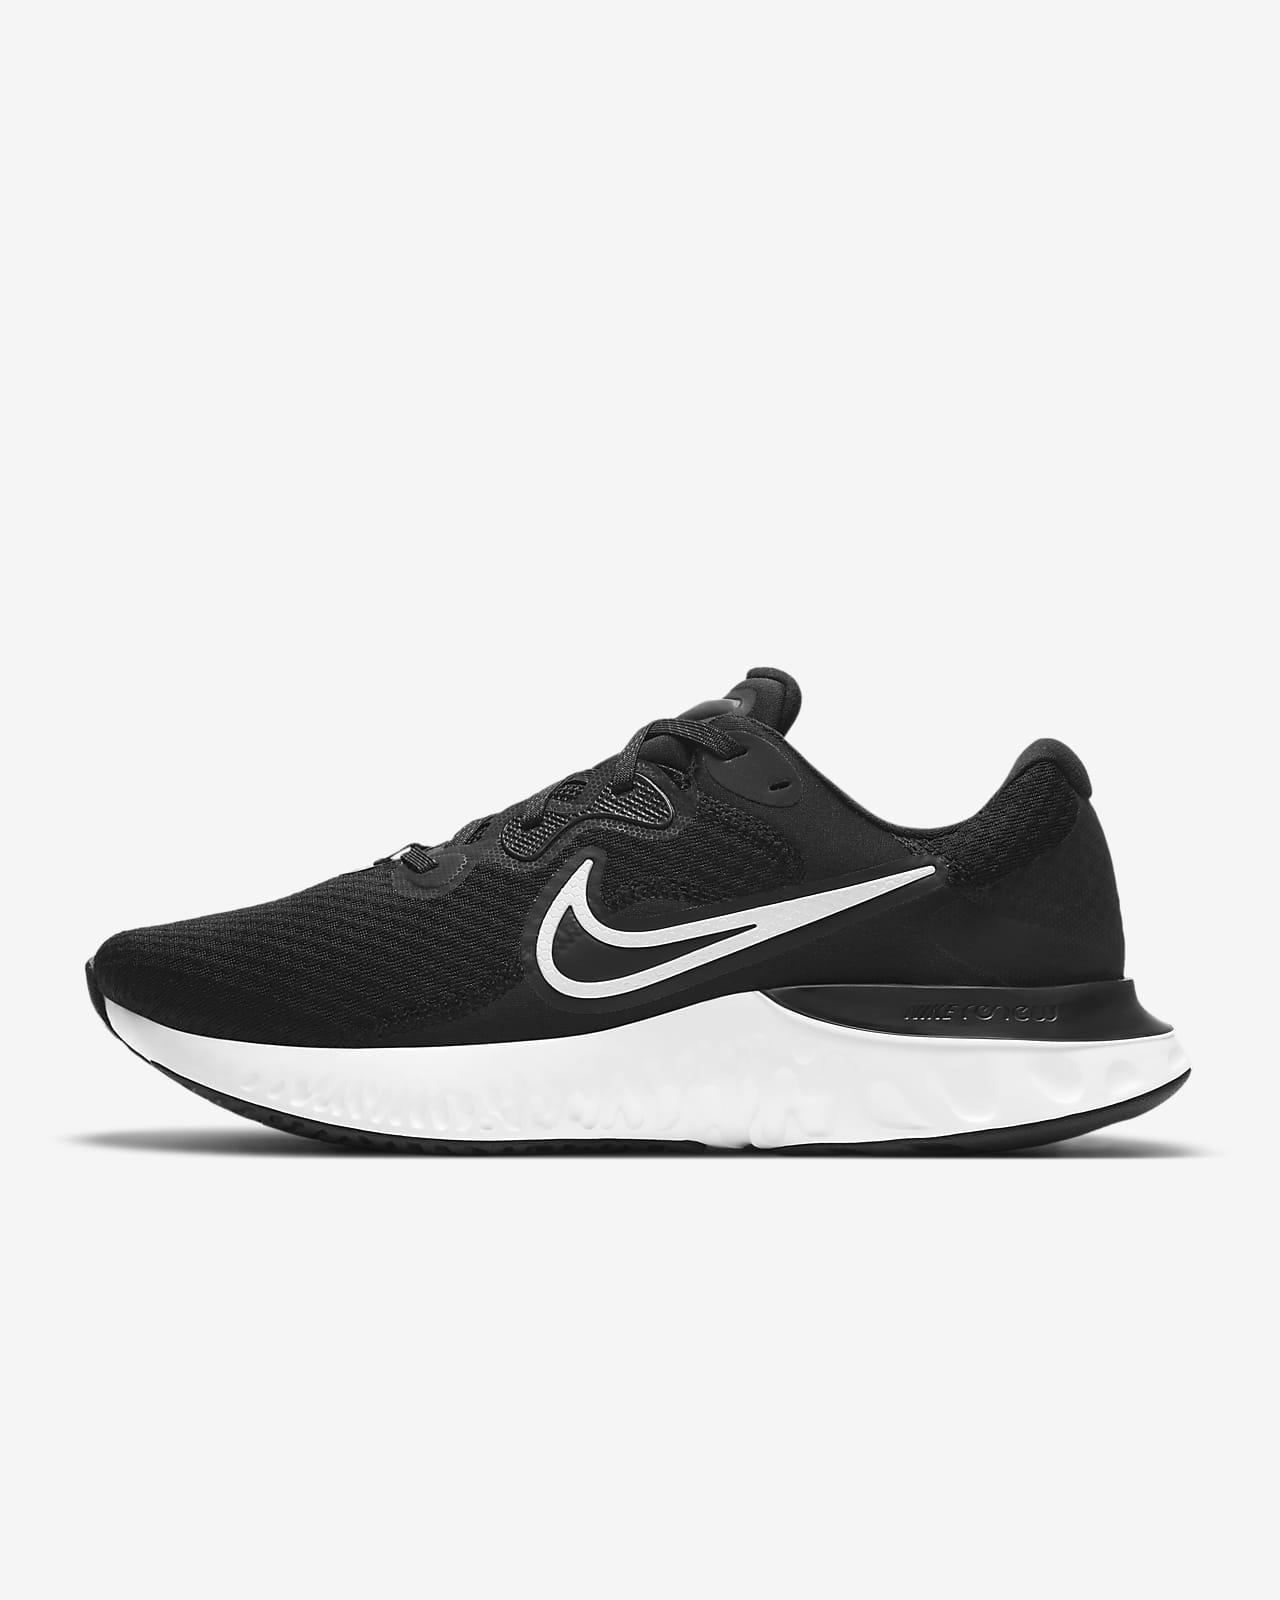 Calzado de running de carretera para hombre Nike Renew Run 2